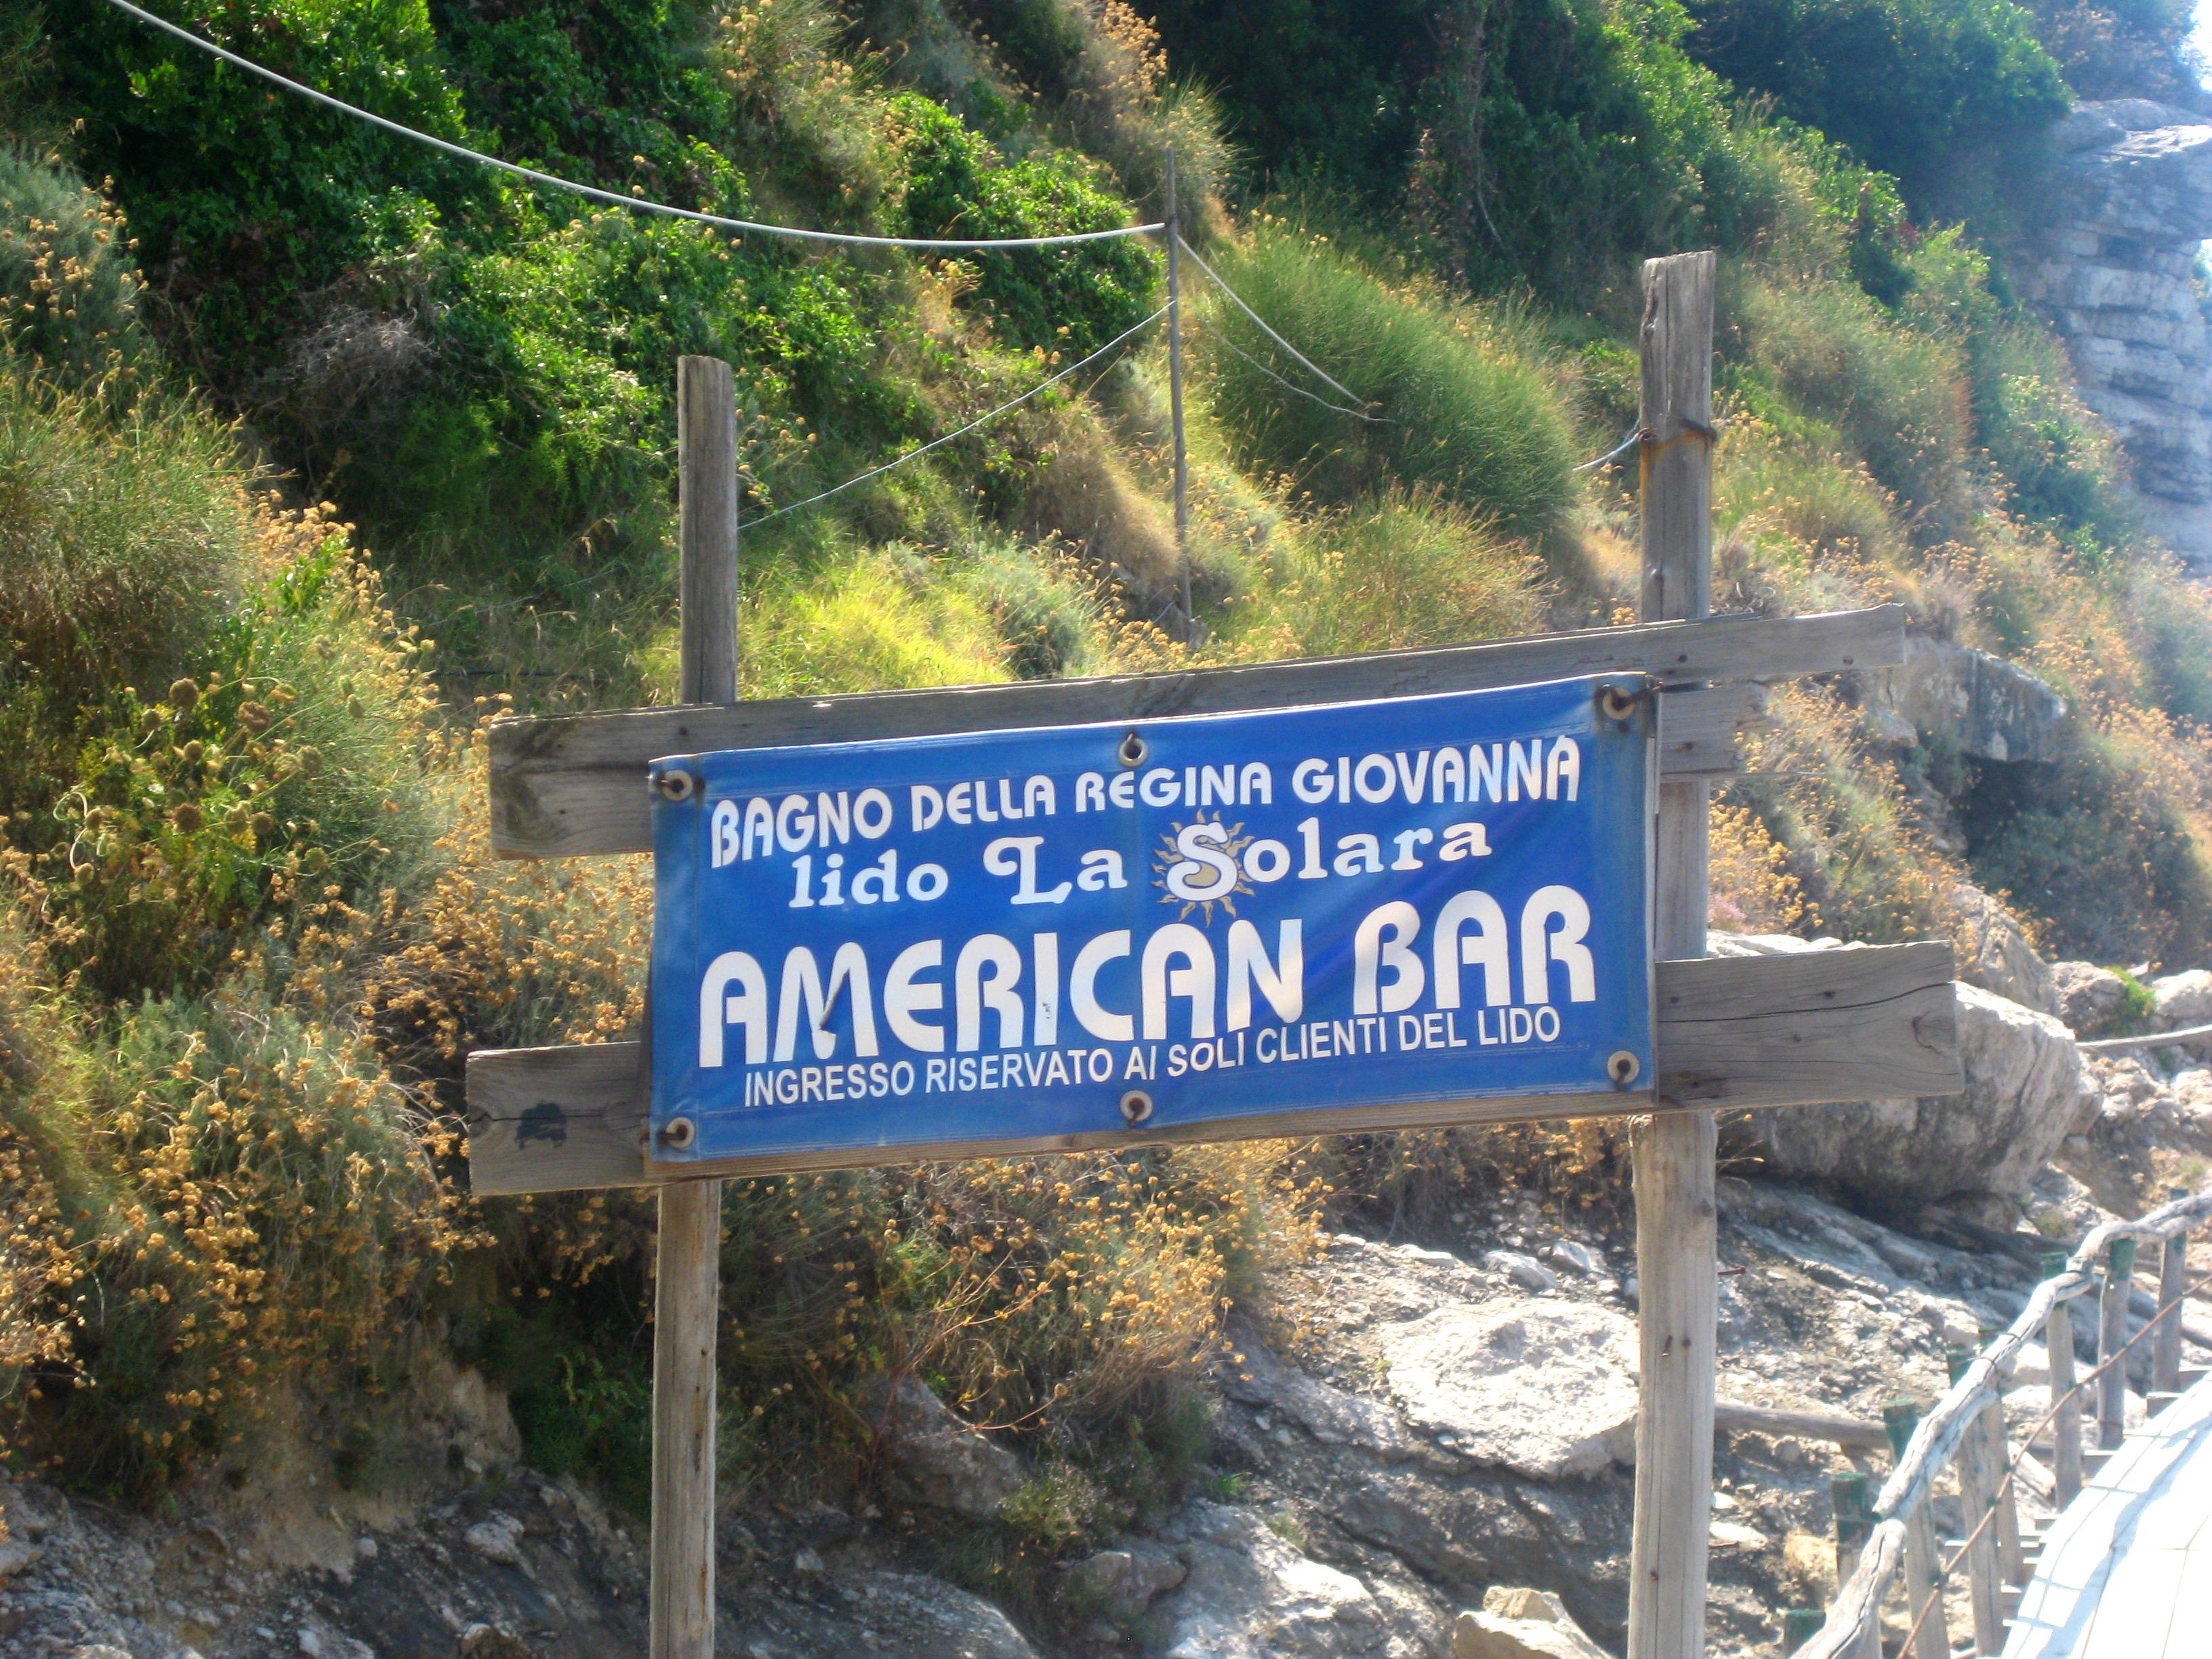 American Bar sign